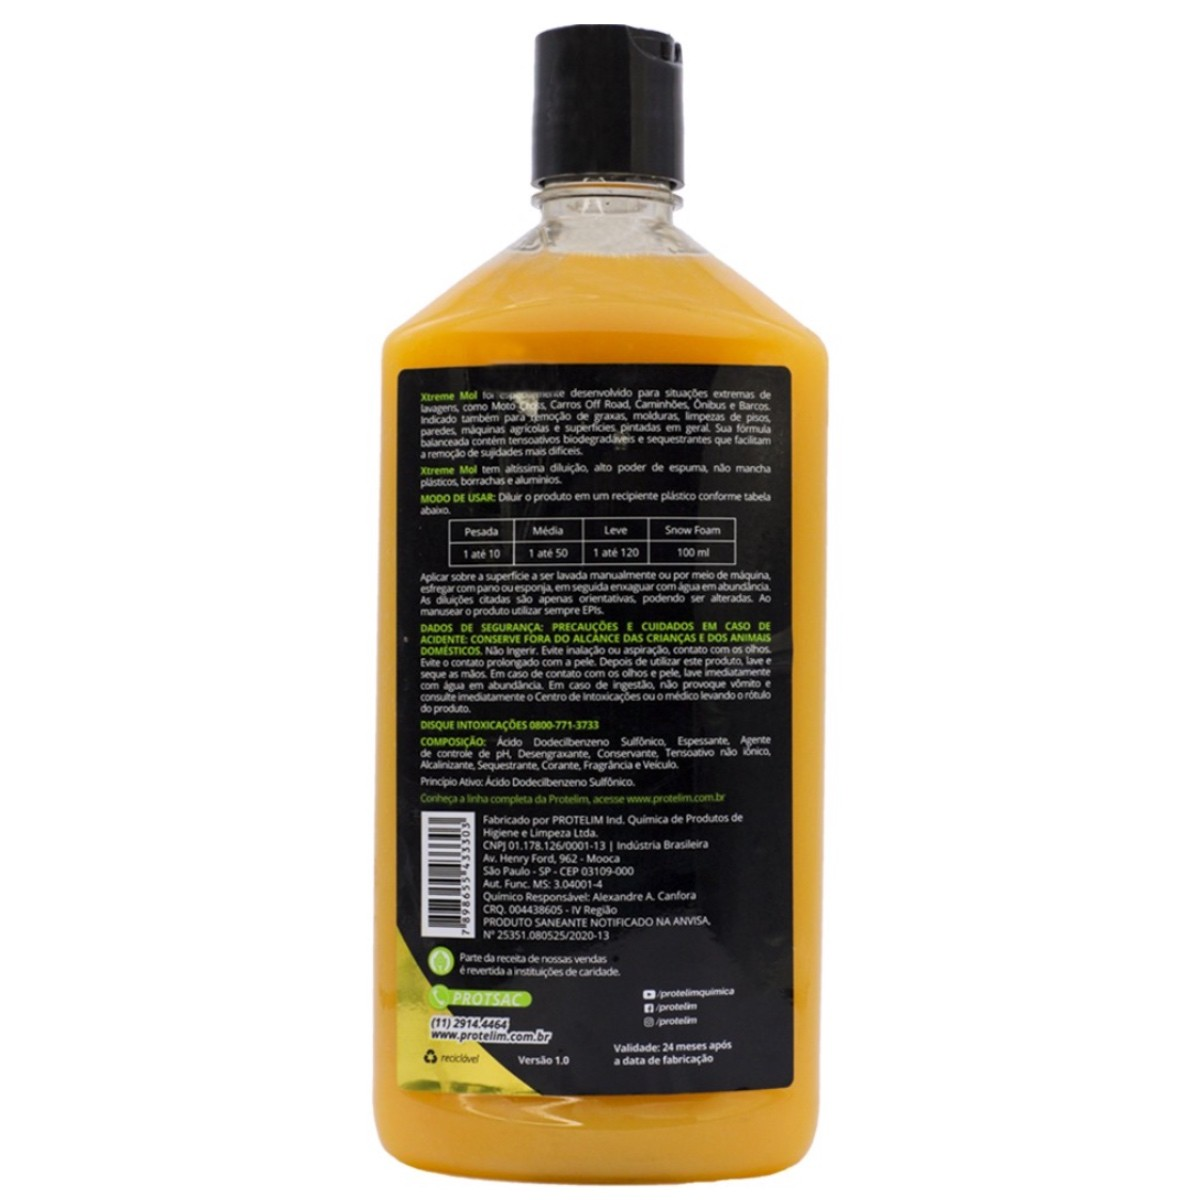 Detergente Desengraxante Carro Xtreme Mol Protelim 500ml